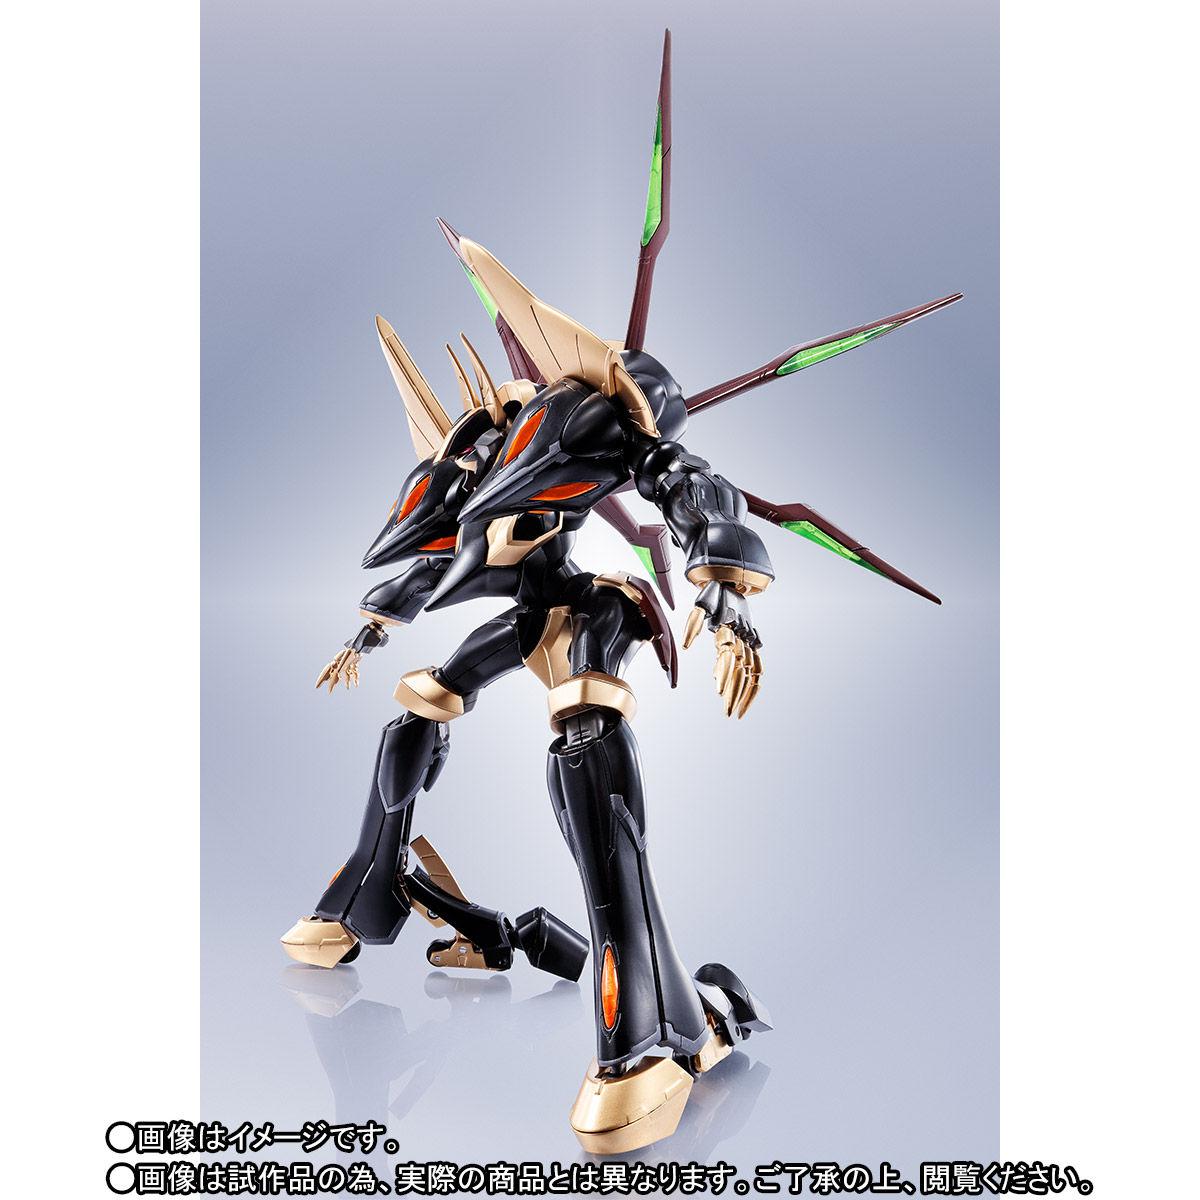 ROBOT魂〈SIDE KMF〉『ガウェイン ~BLACK REBELLION~』コードギアス 可動フィギュア-010